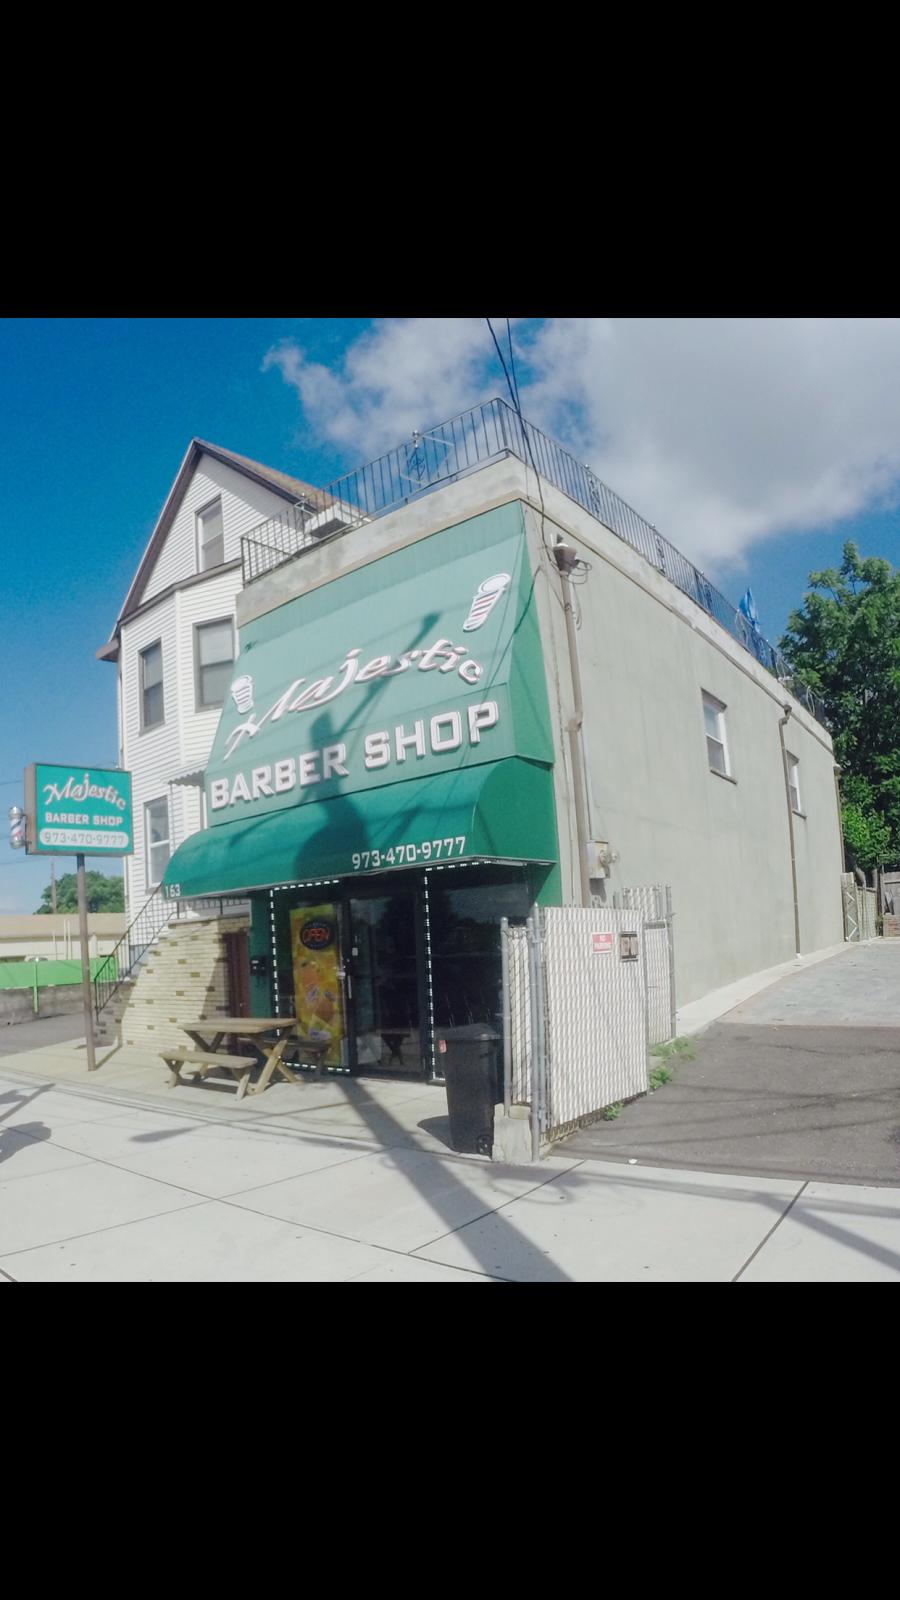 Majestic barbershop - hair care  | Photo 5 of 10 | Address: 163 Passaic St, Garfield, NJ 07026, USA | Phone: (973) 470-9777